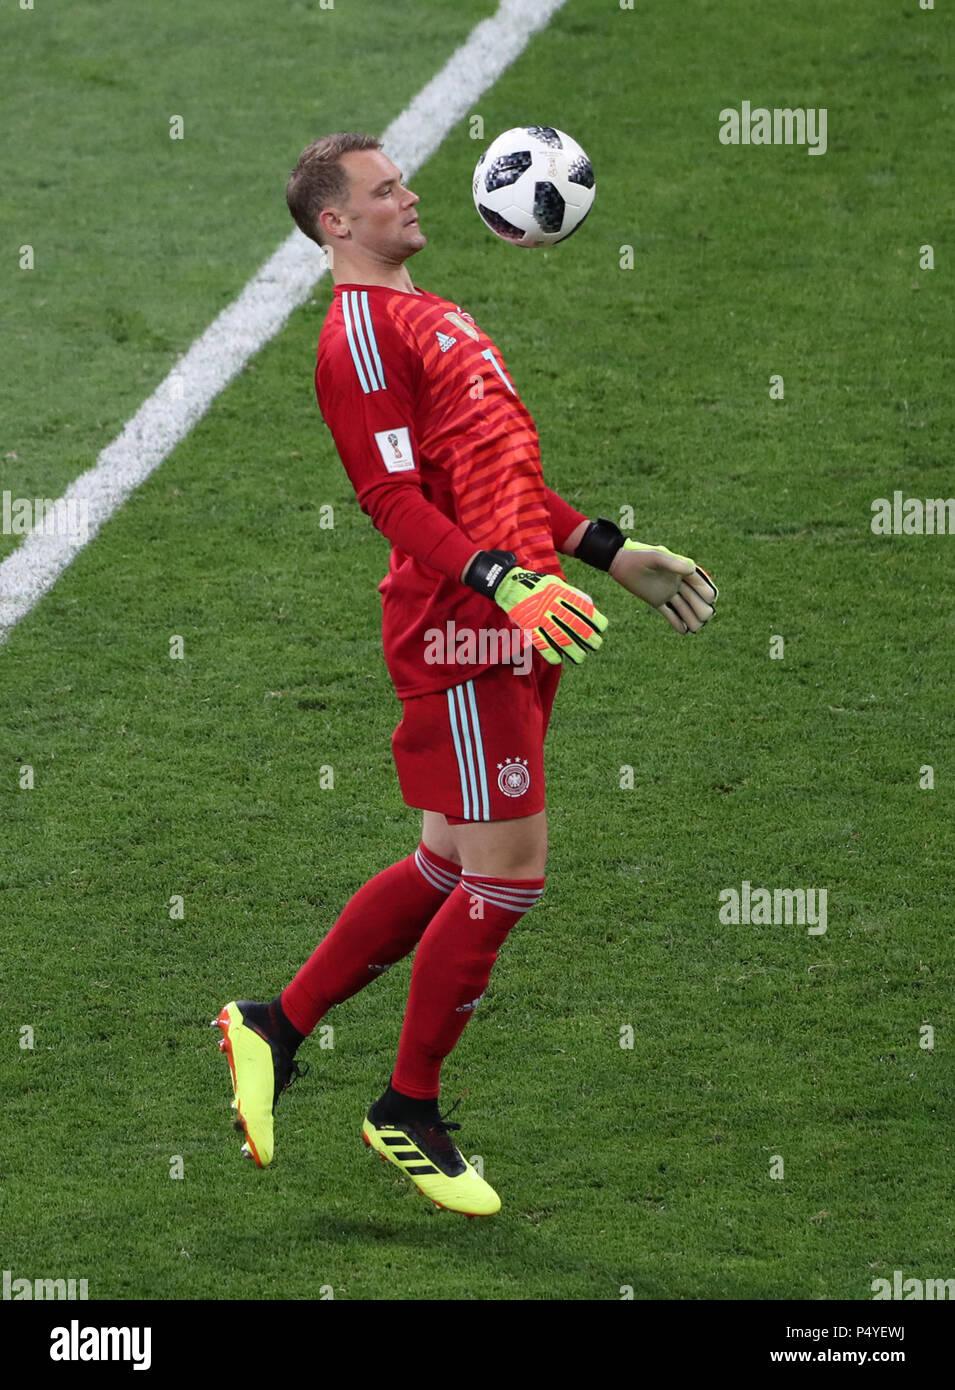 Manuel Neuer Stock Photos & Manuel Neuer Stock Images - Alamy